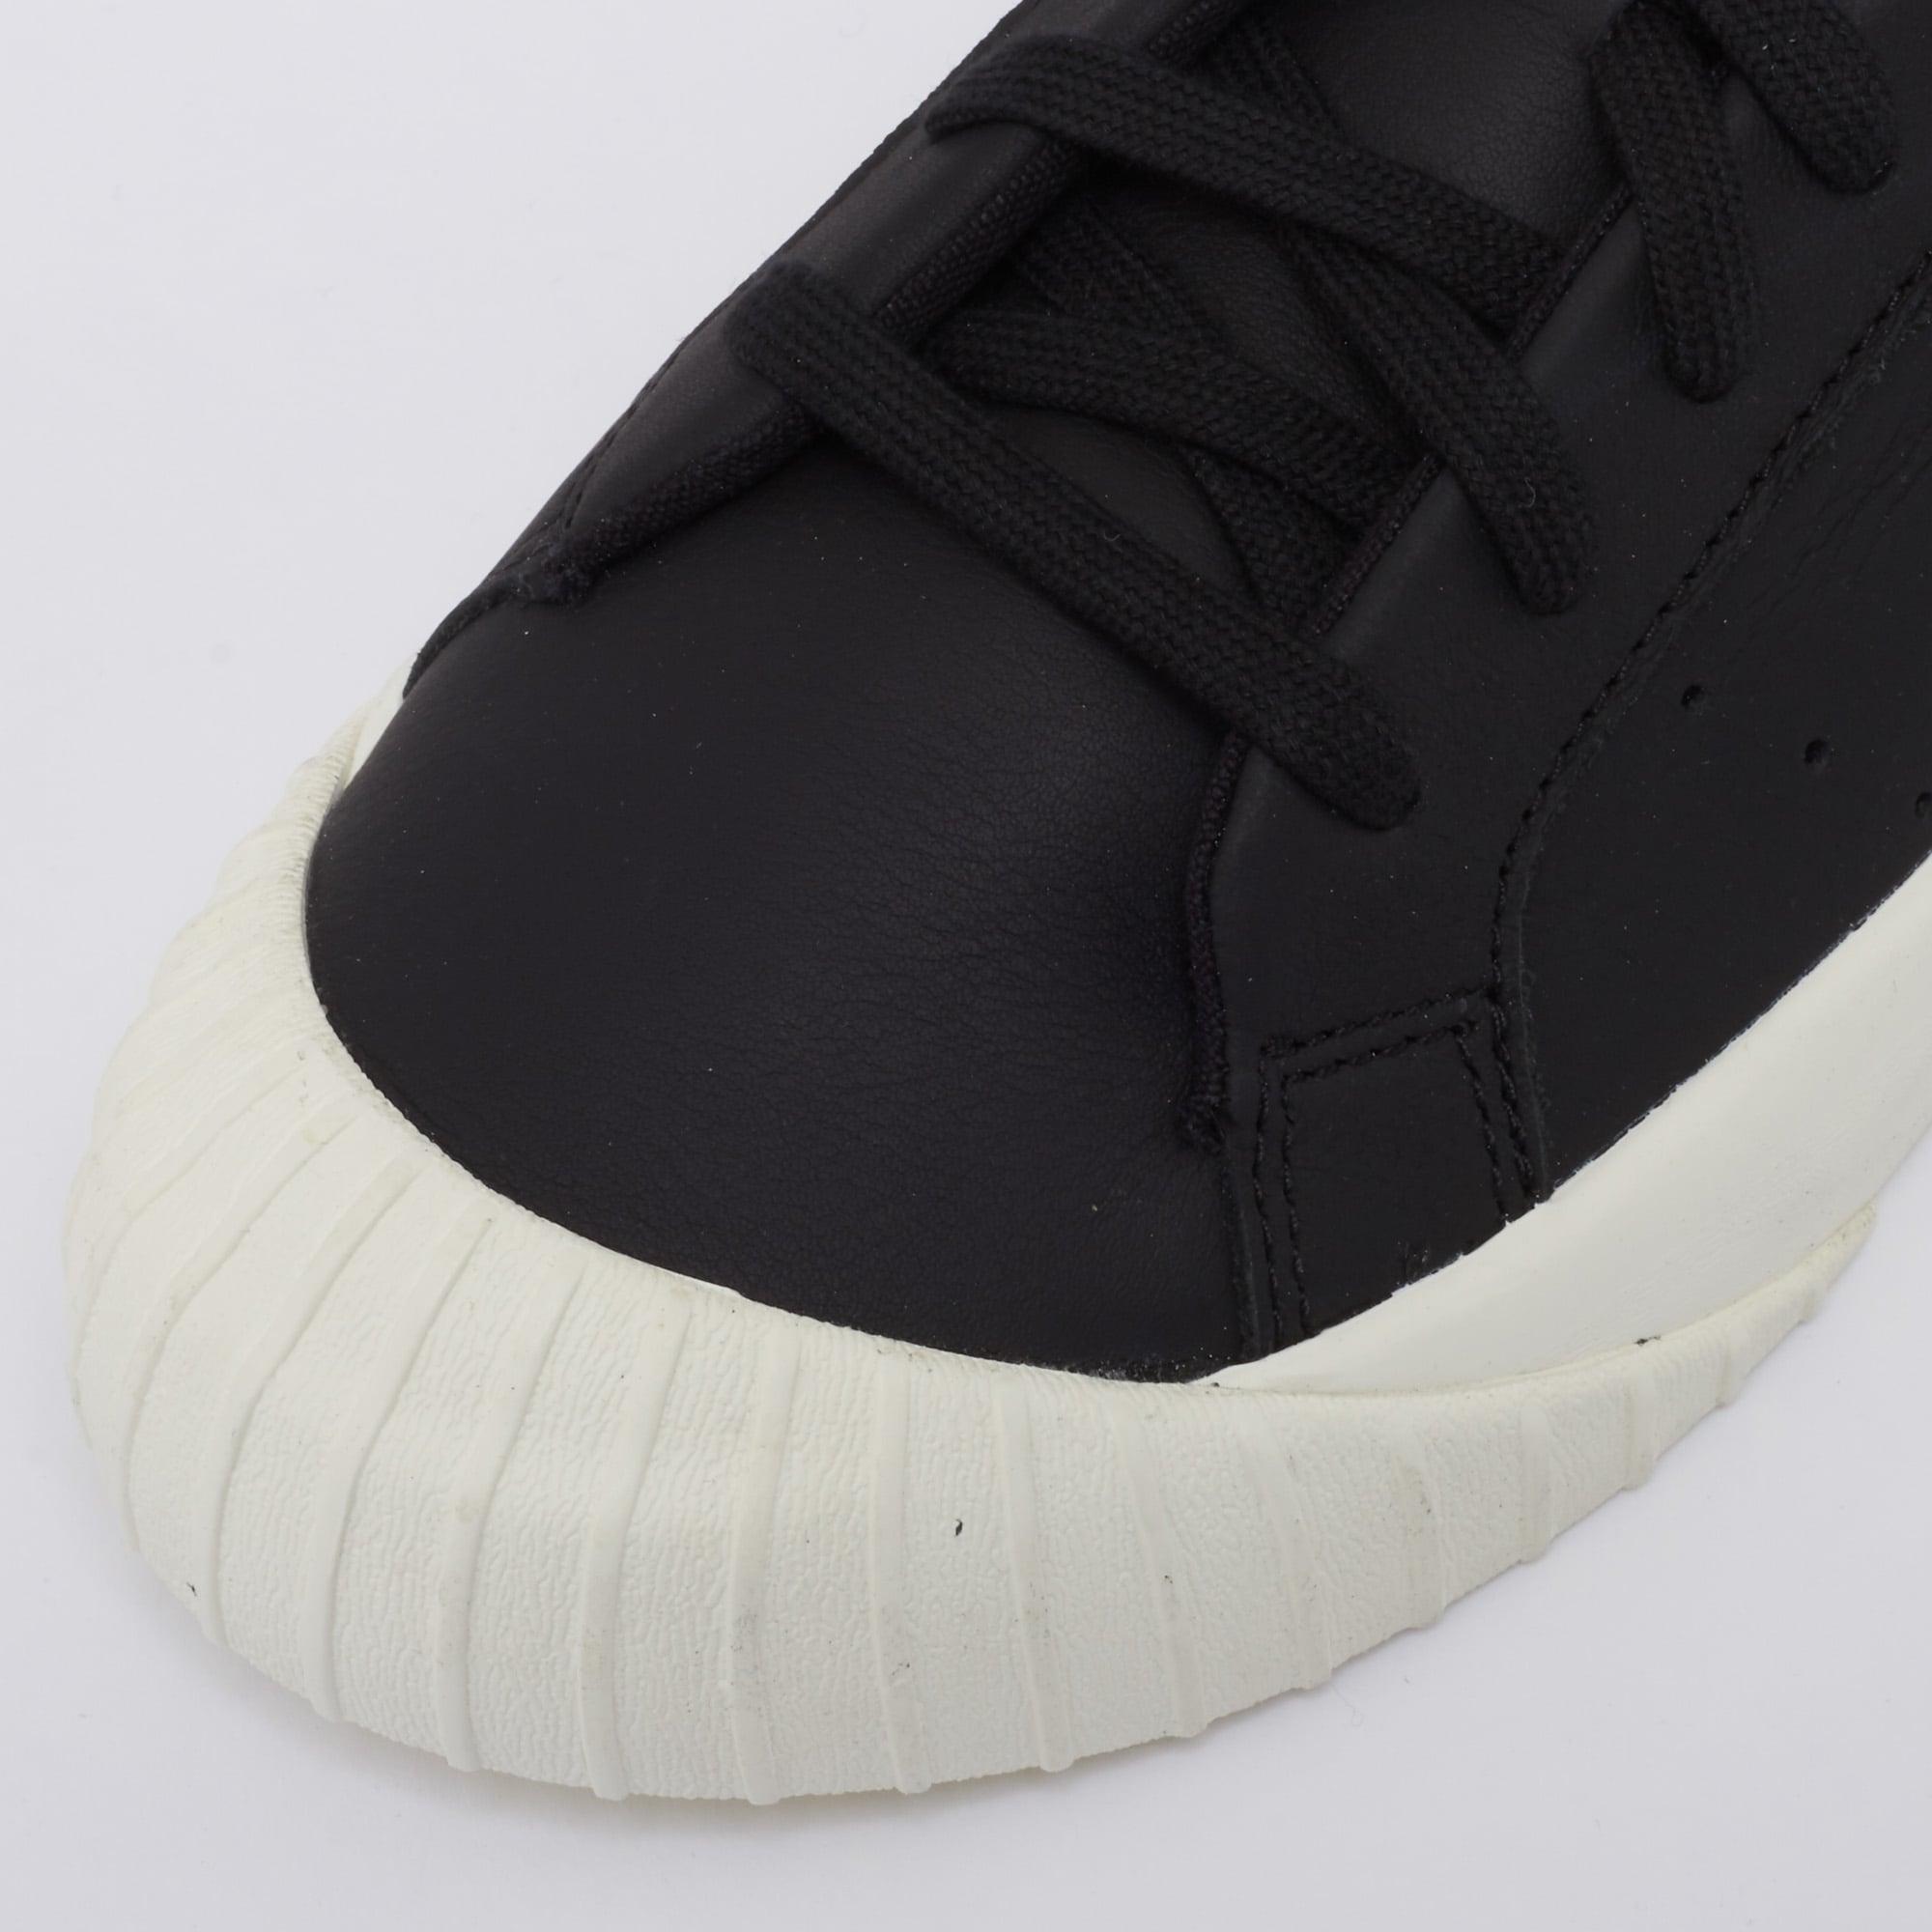 eb8c2c68eb29 Adidas Originals Womens Everyn Sneakers